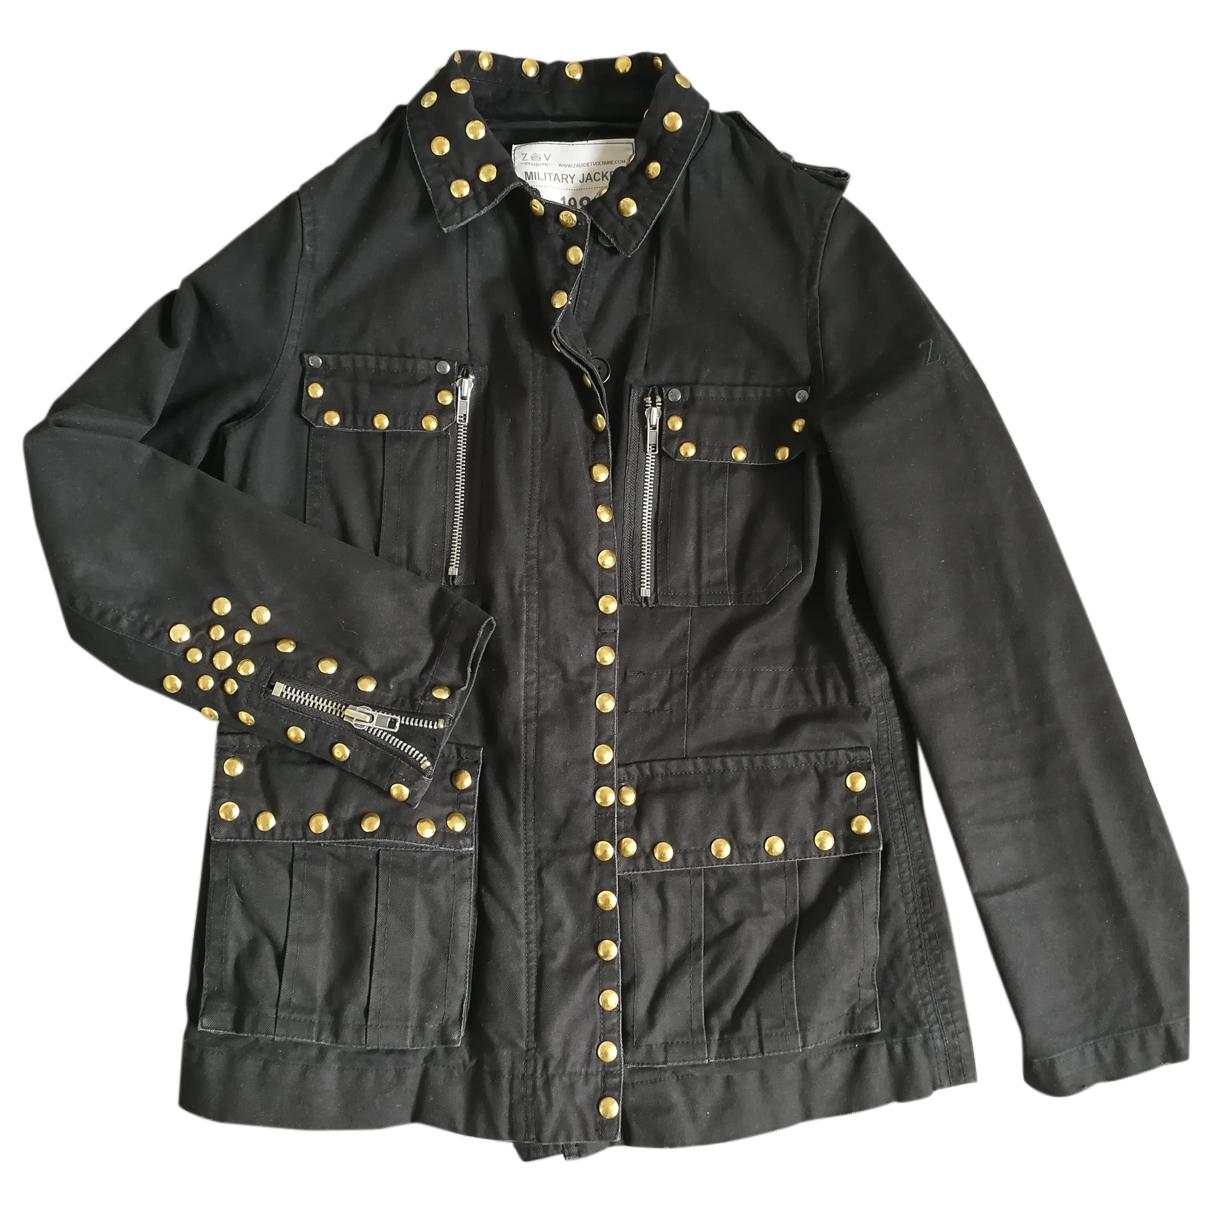 Zadig & Voltaire \N Black Cotton jacket for Women XS International